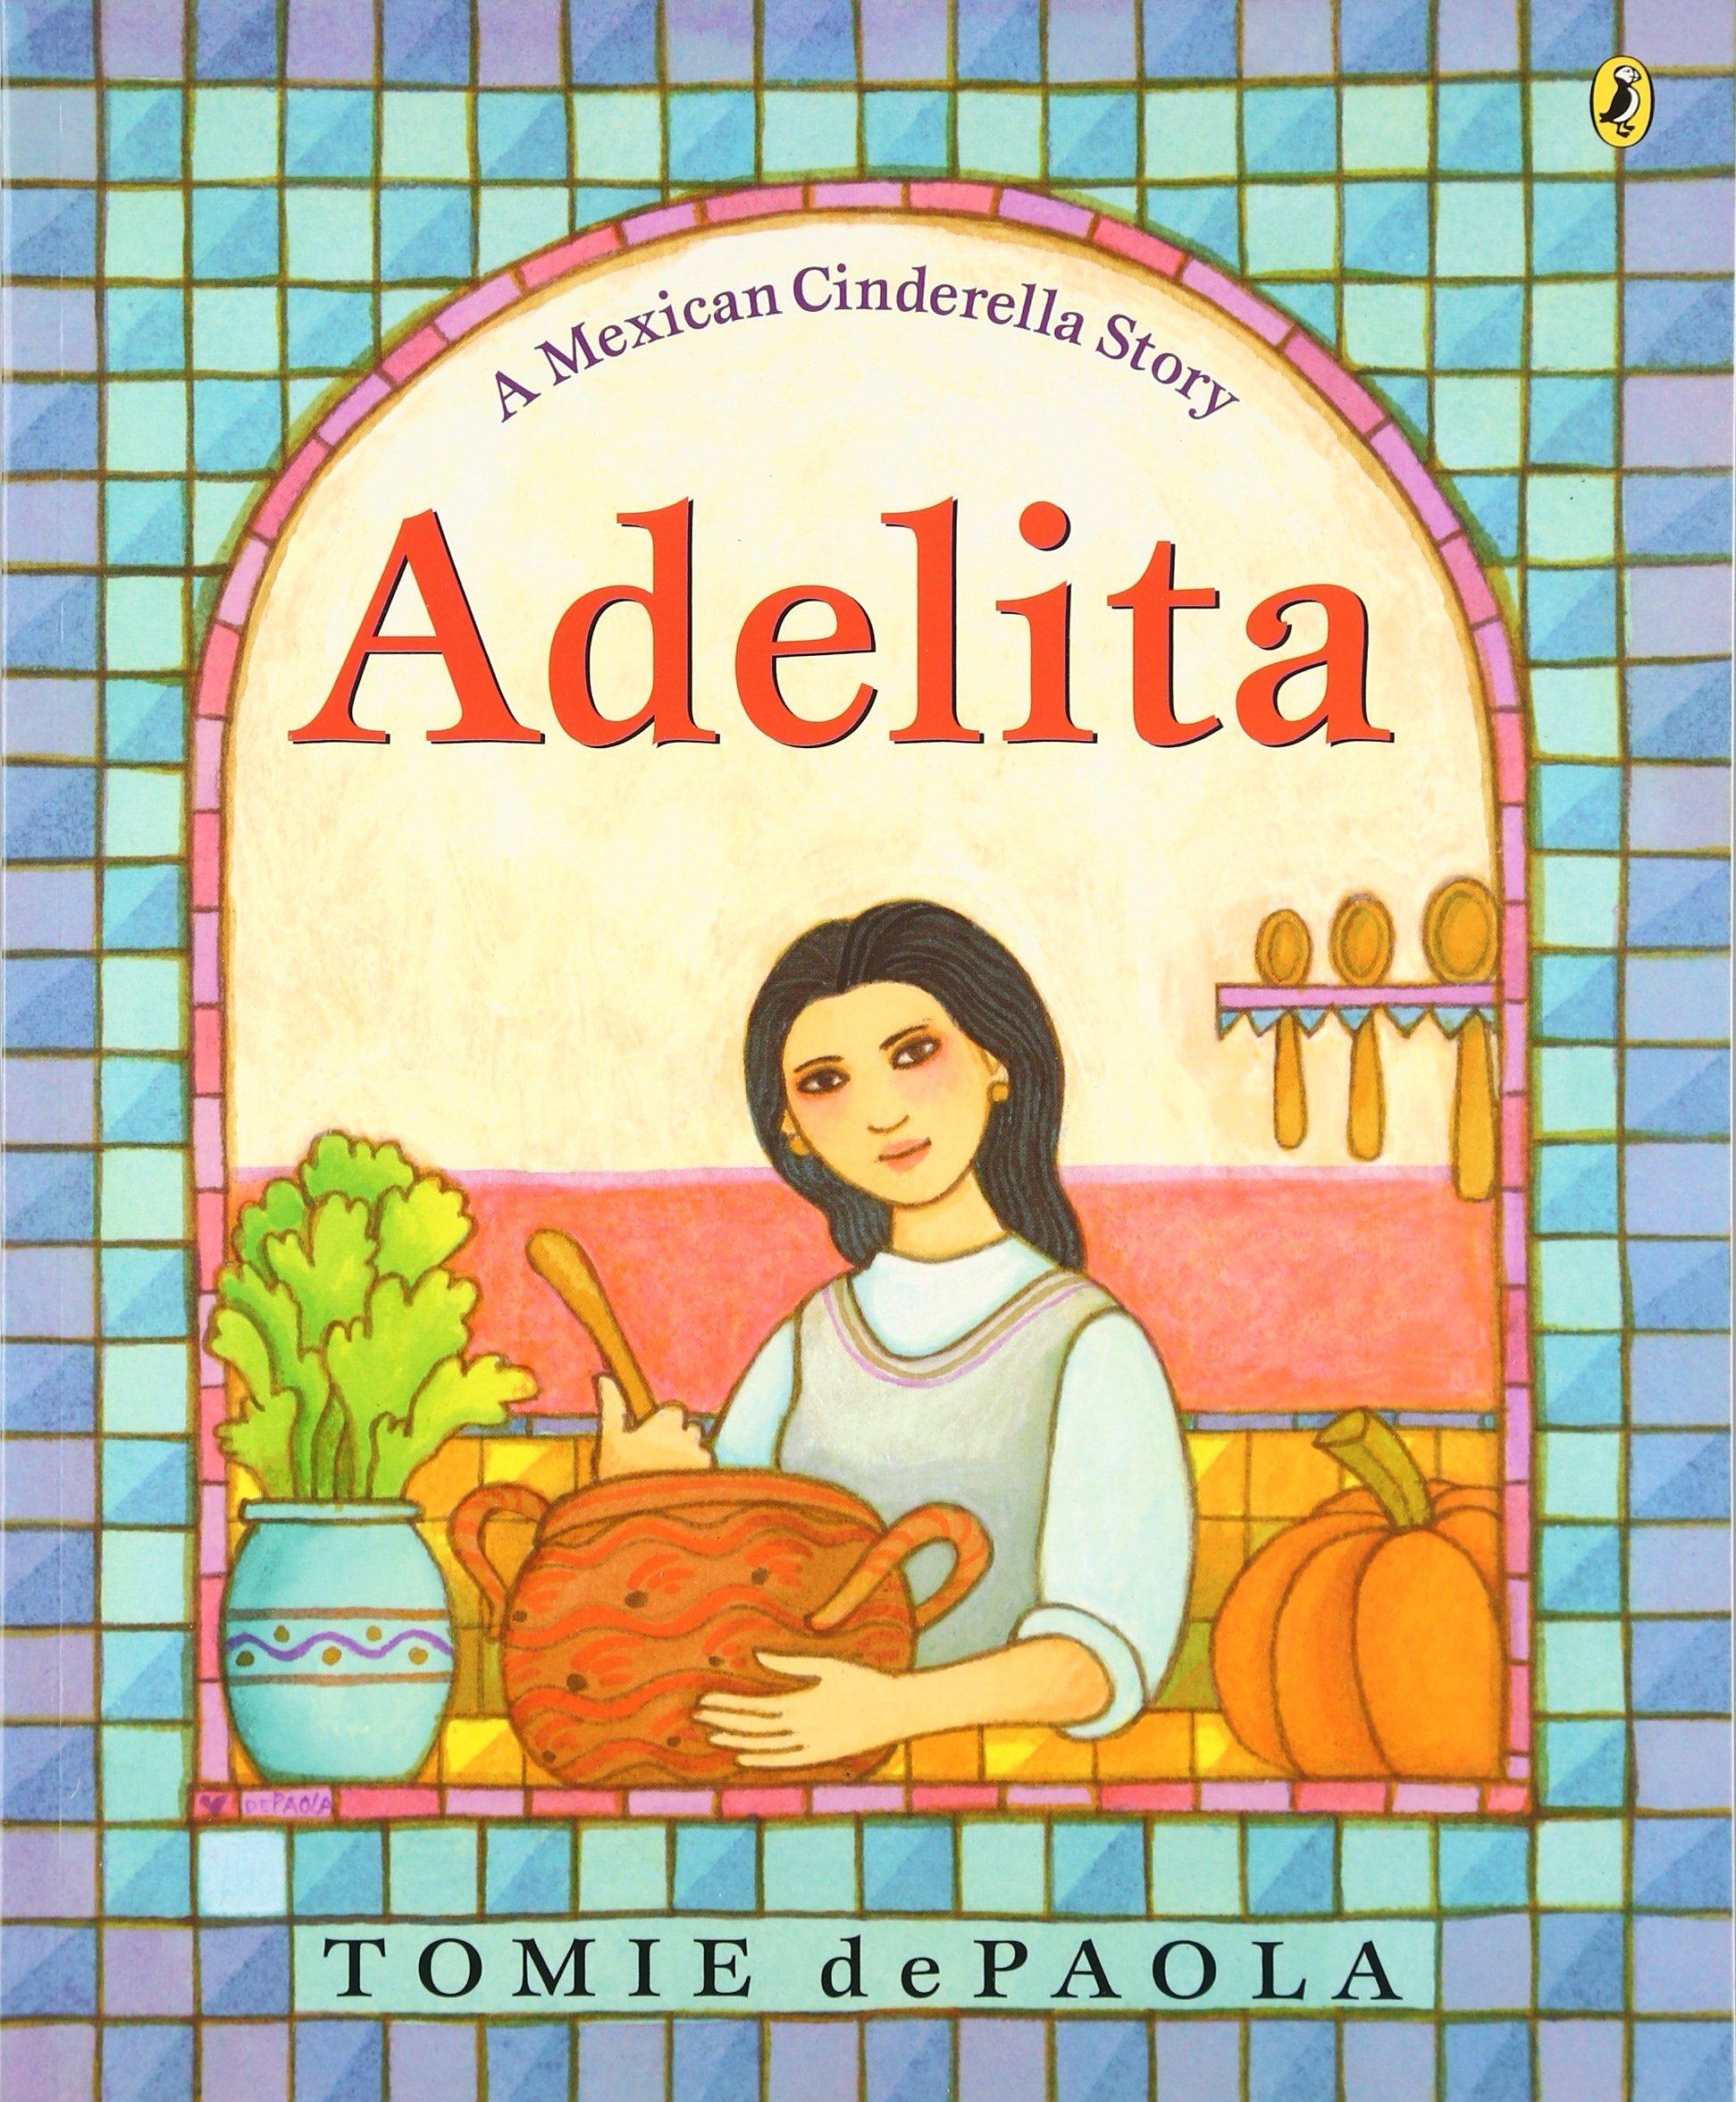 adelita tomie depaola 9780142401873 amazon com books